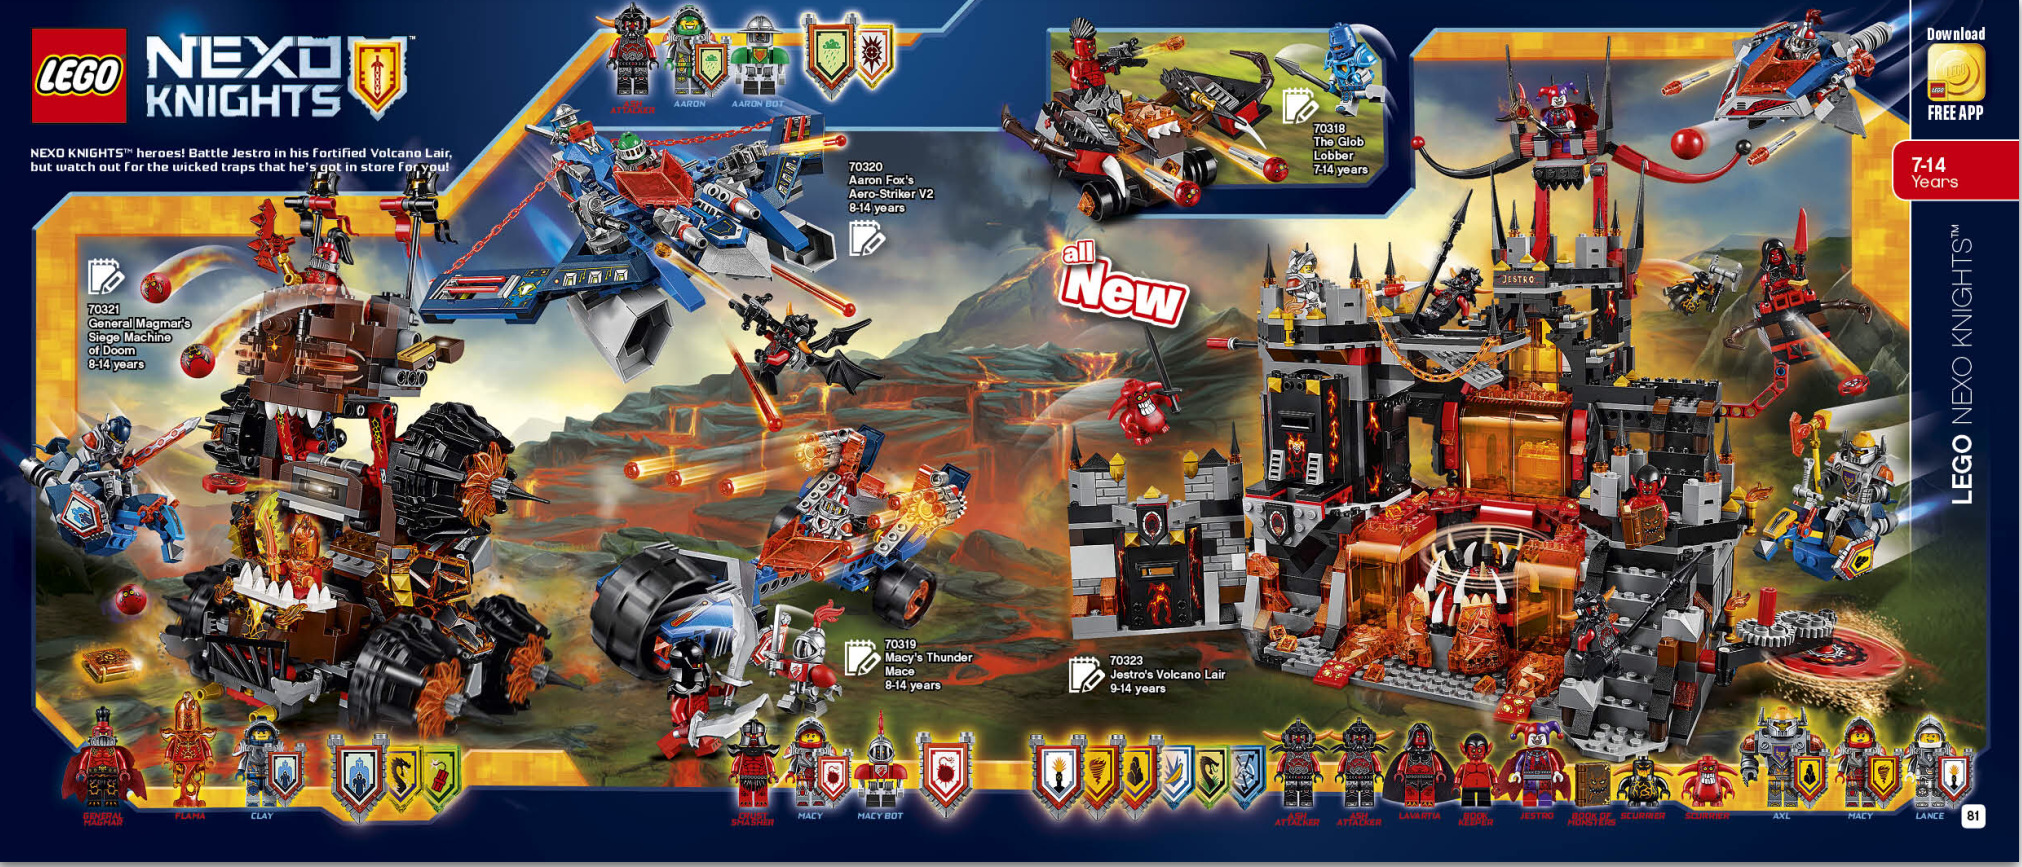 Second Half 2016 Lego Catalogue June December